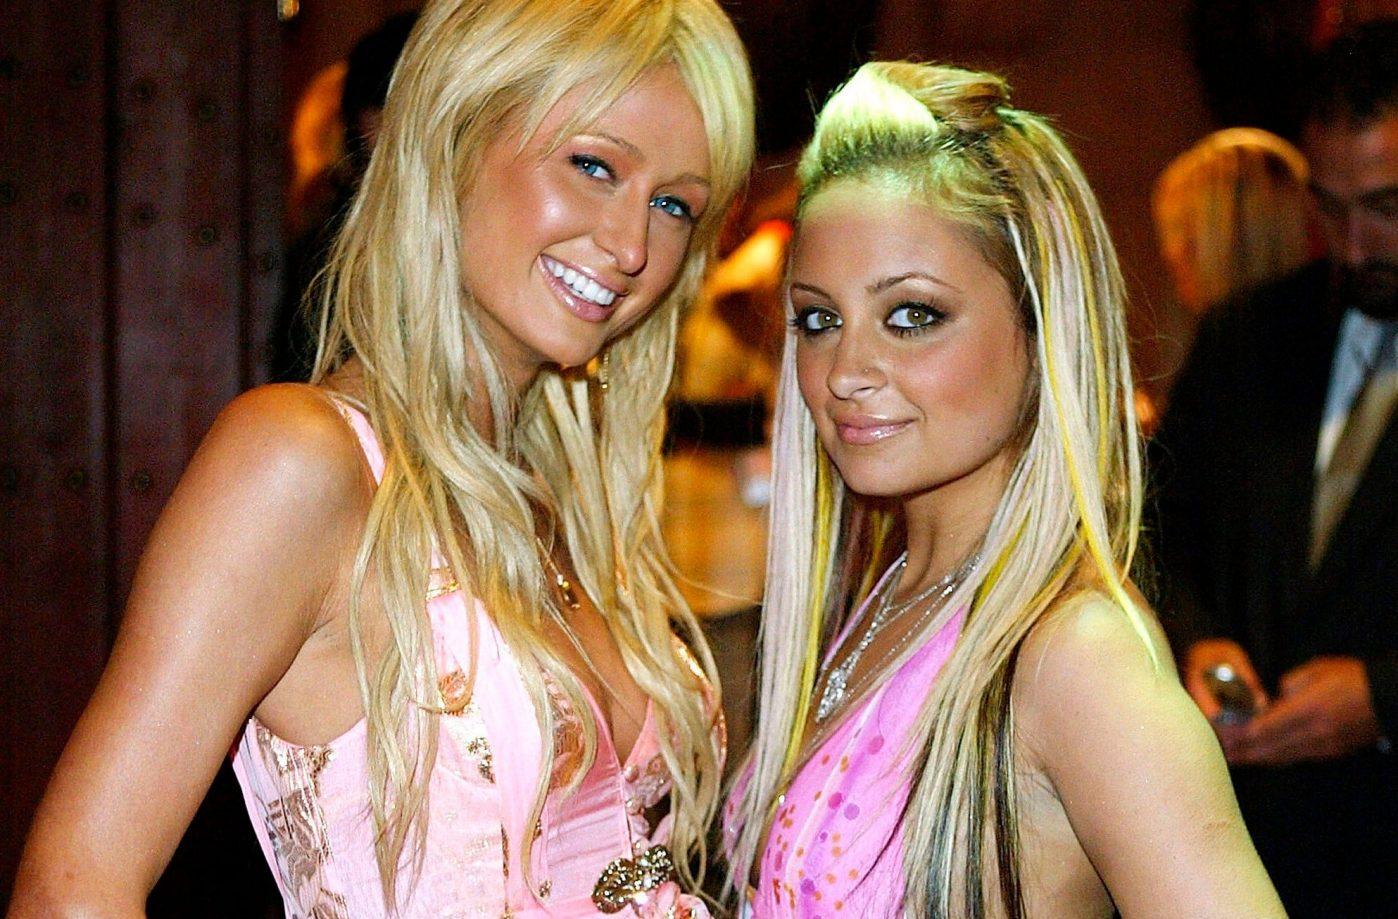 Paris Hilton and Nicole Richie in The Simple Life